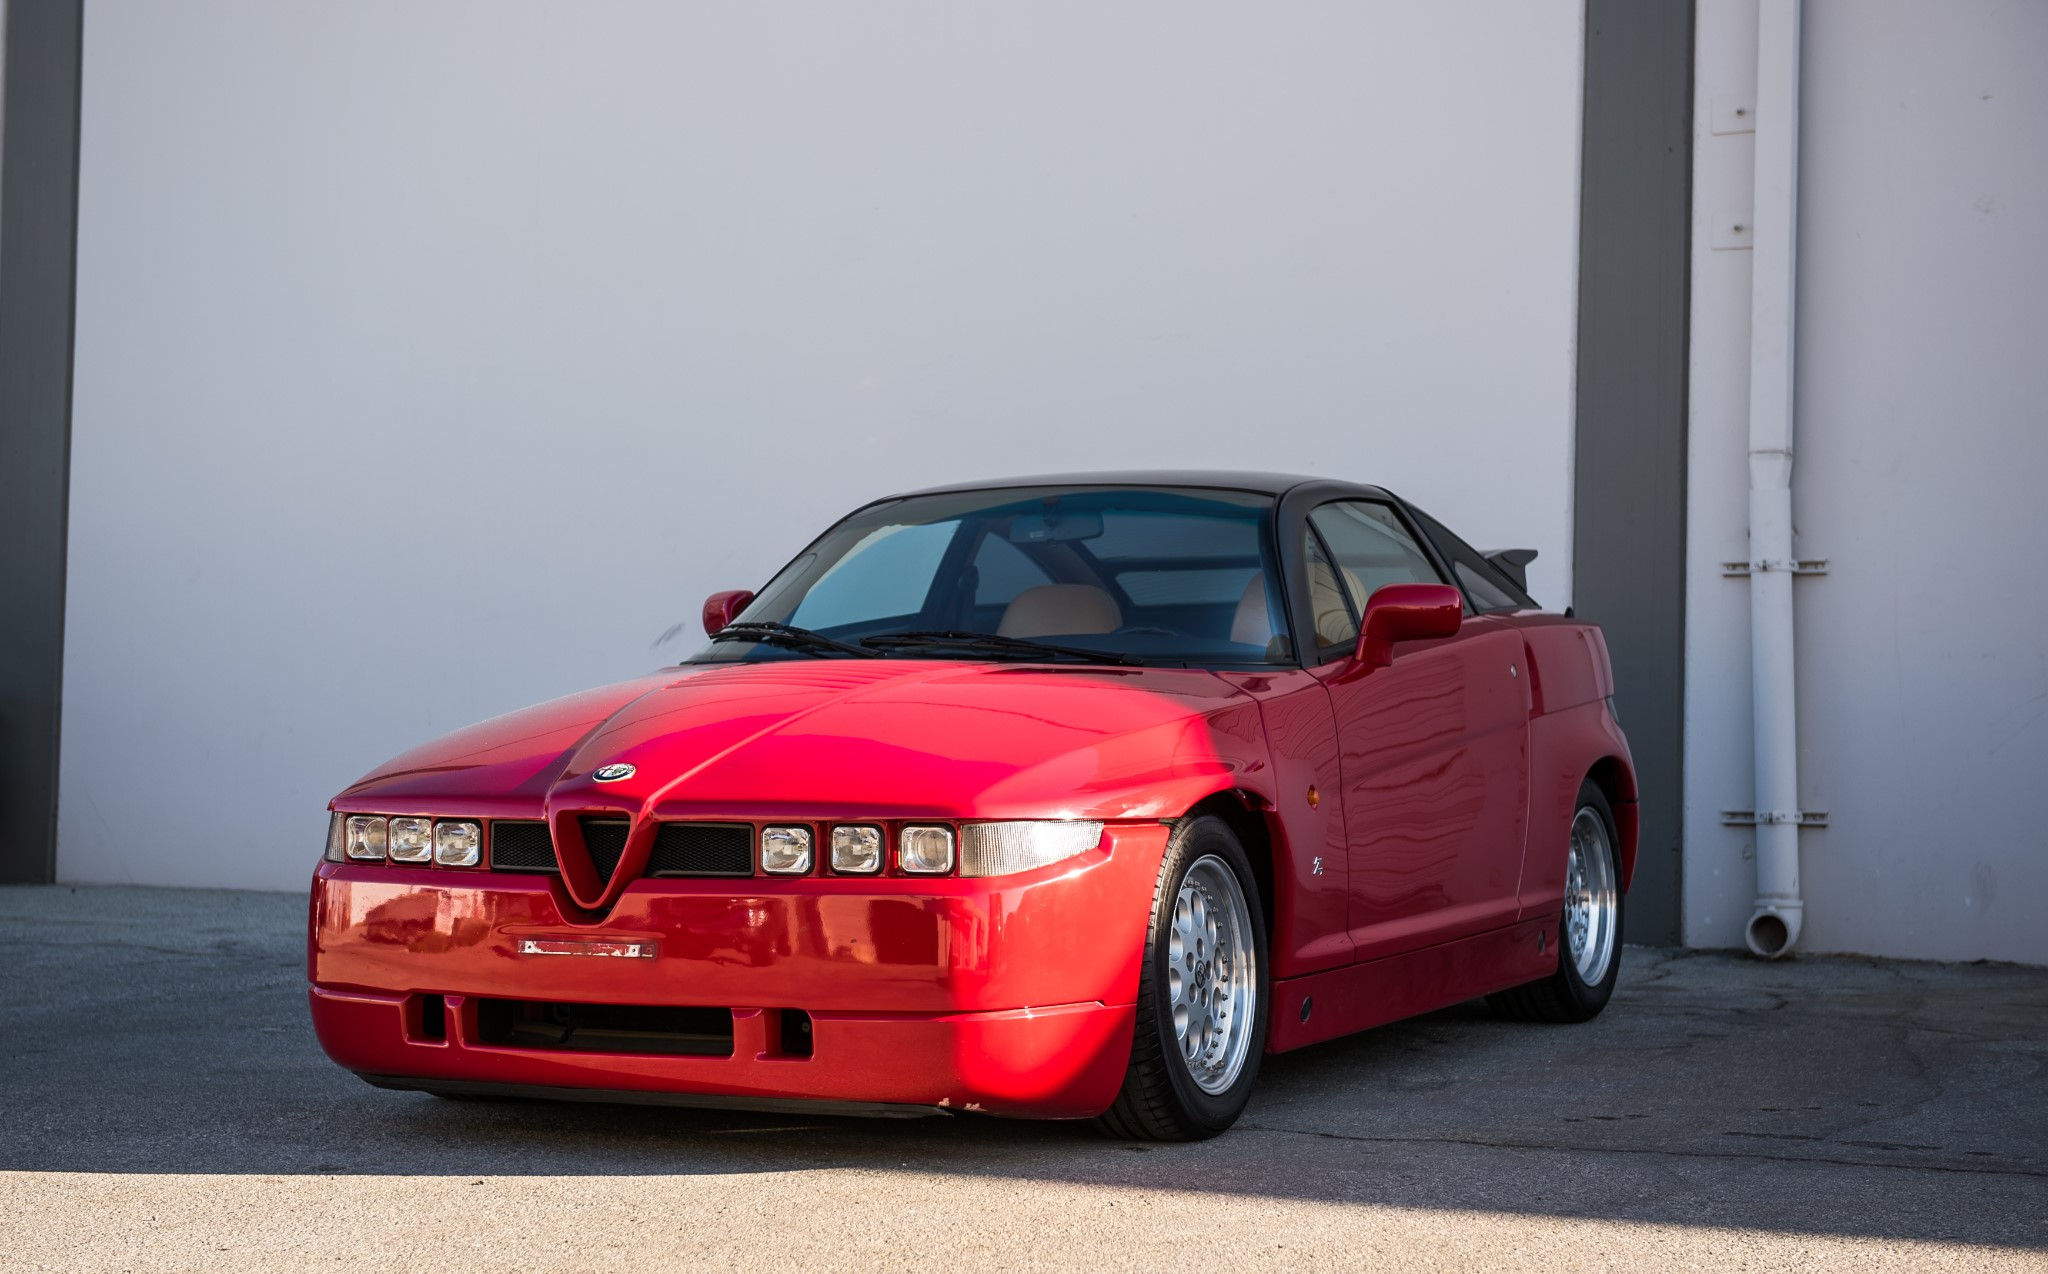 red 1991 Alfa Romeo SZ front 3/4